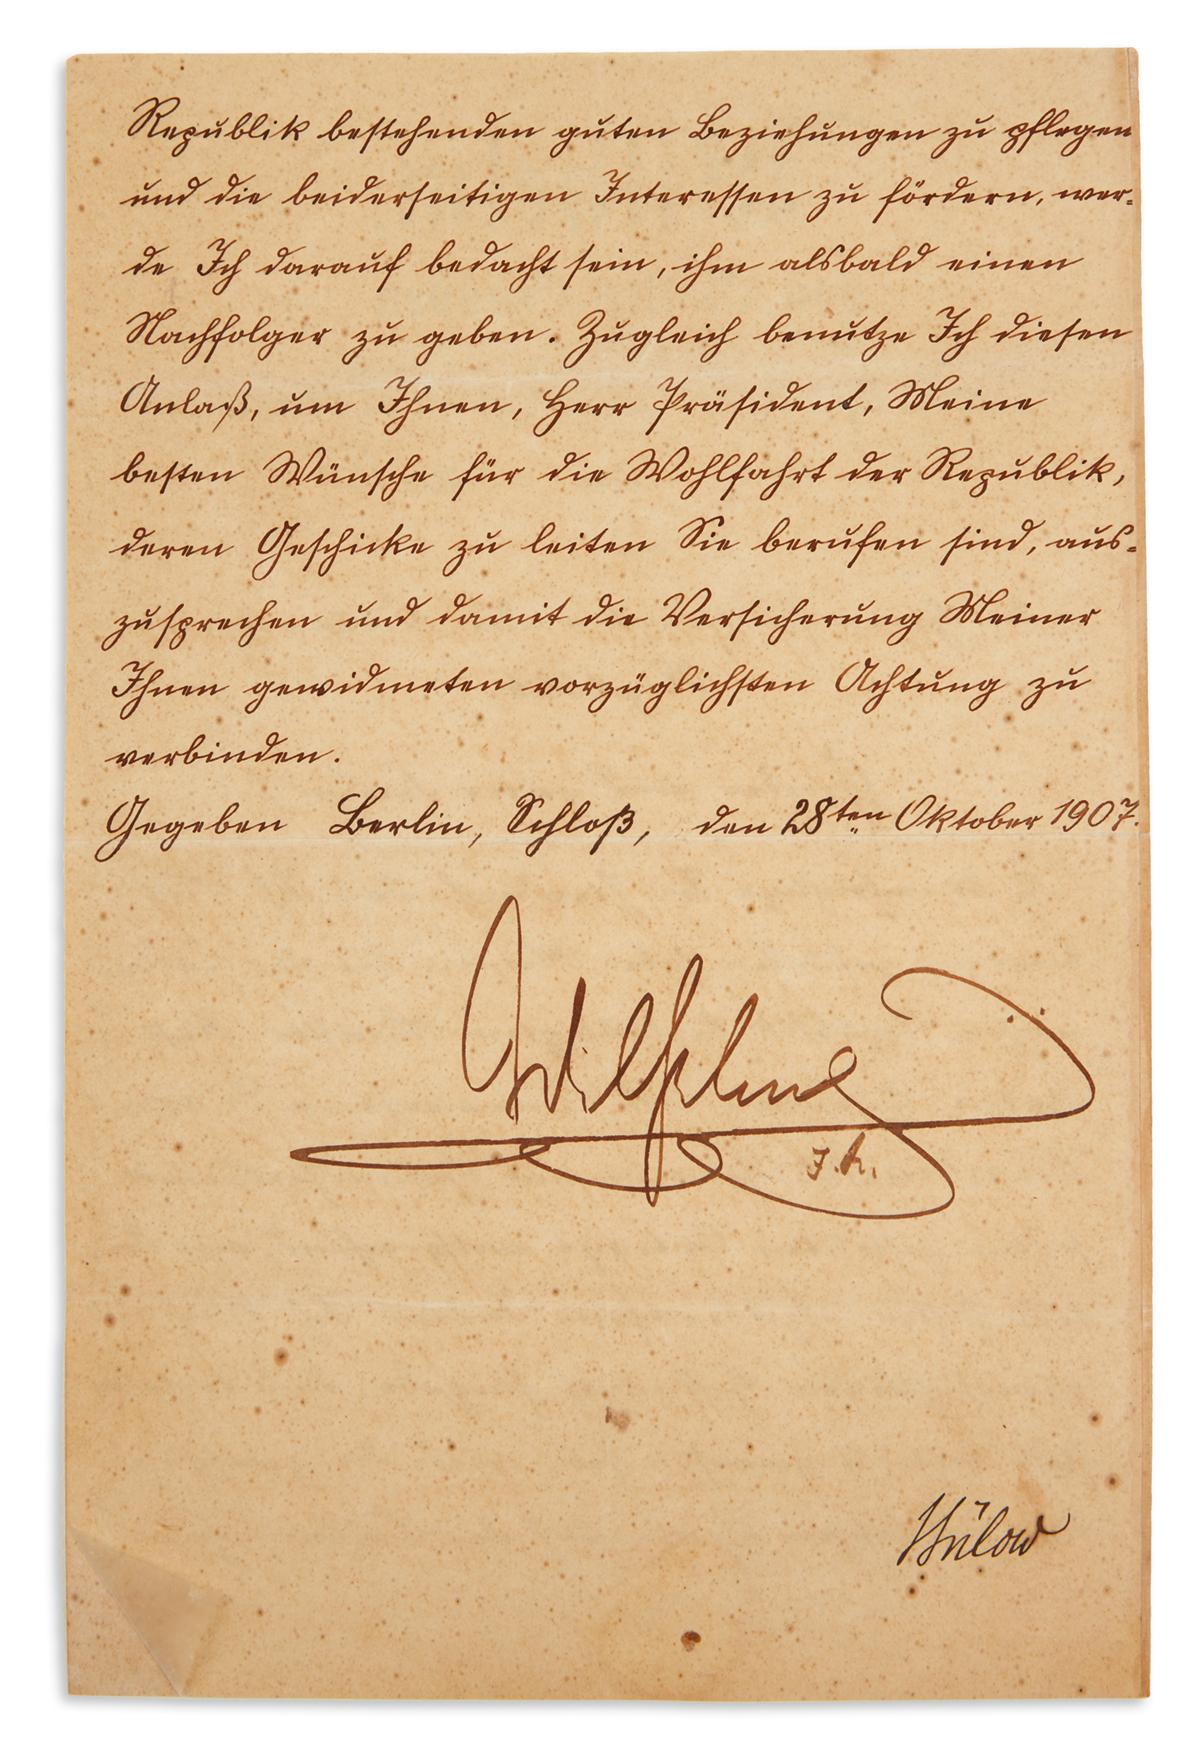 WILHELM-II;-EMPEROR-OF-GERMANY-Letter-Signed-Wilhelm--IR-as-